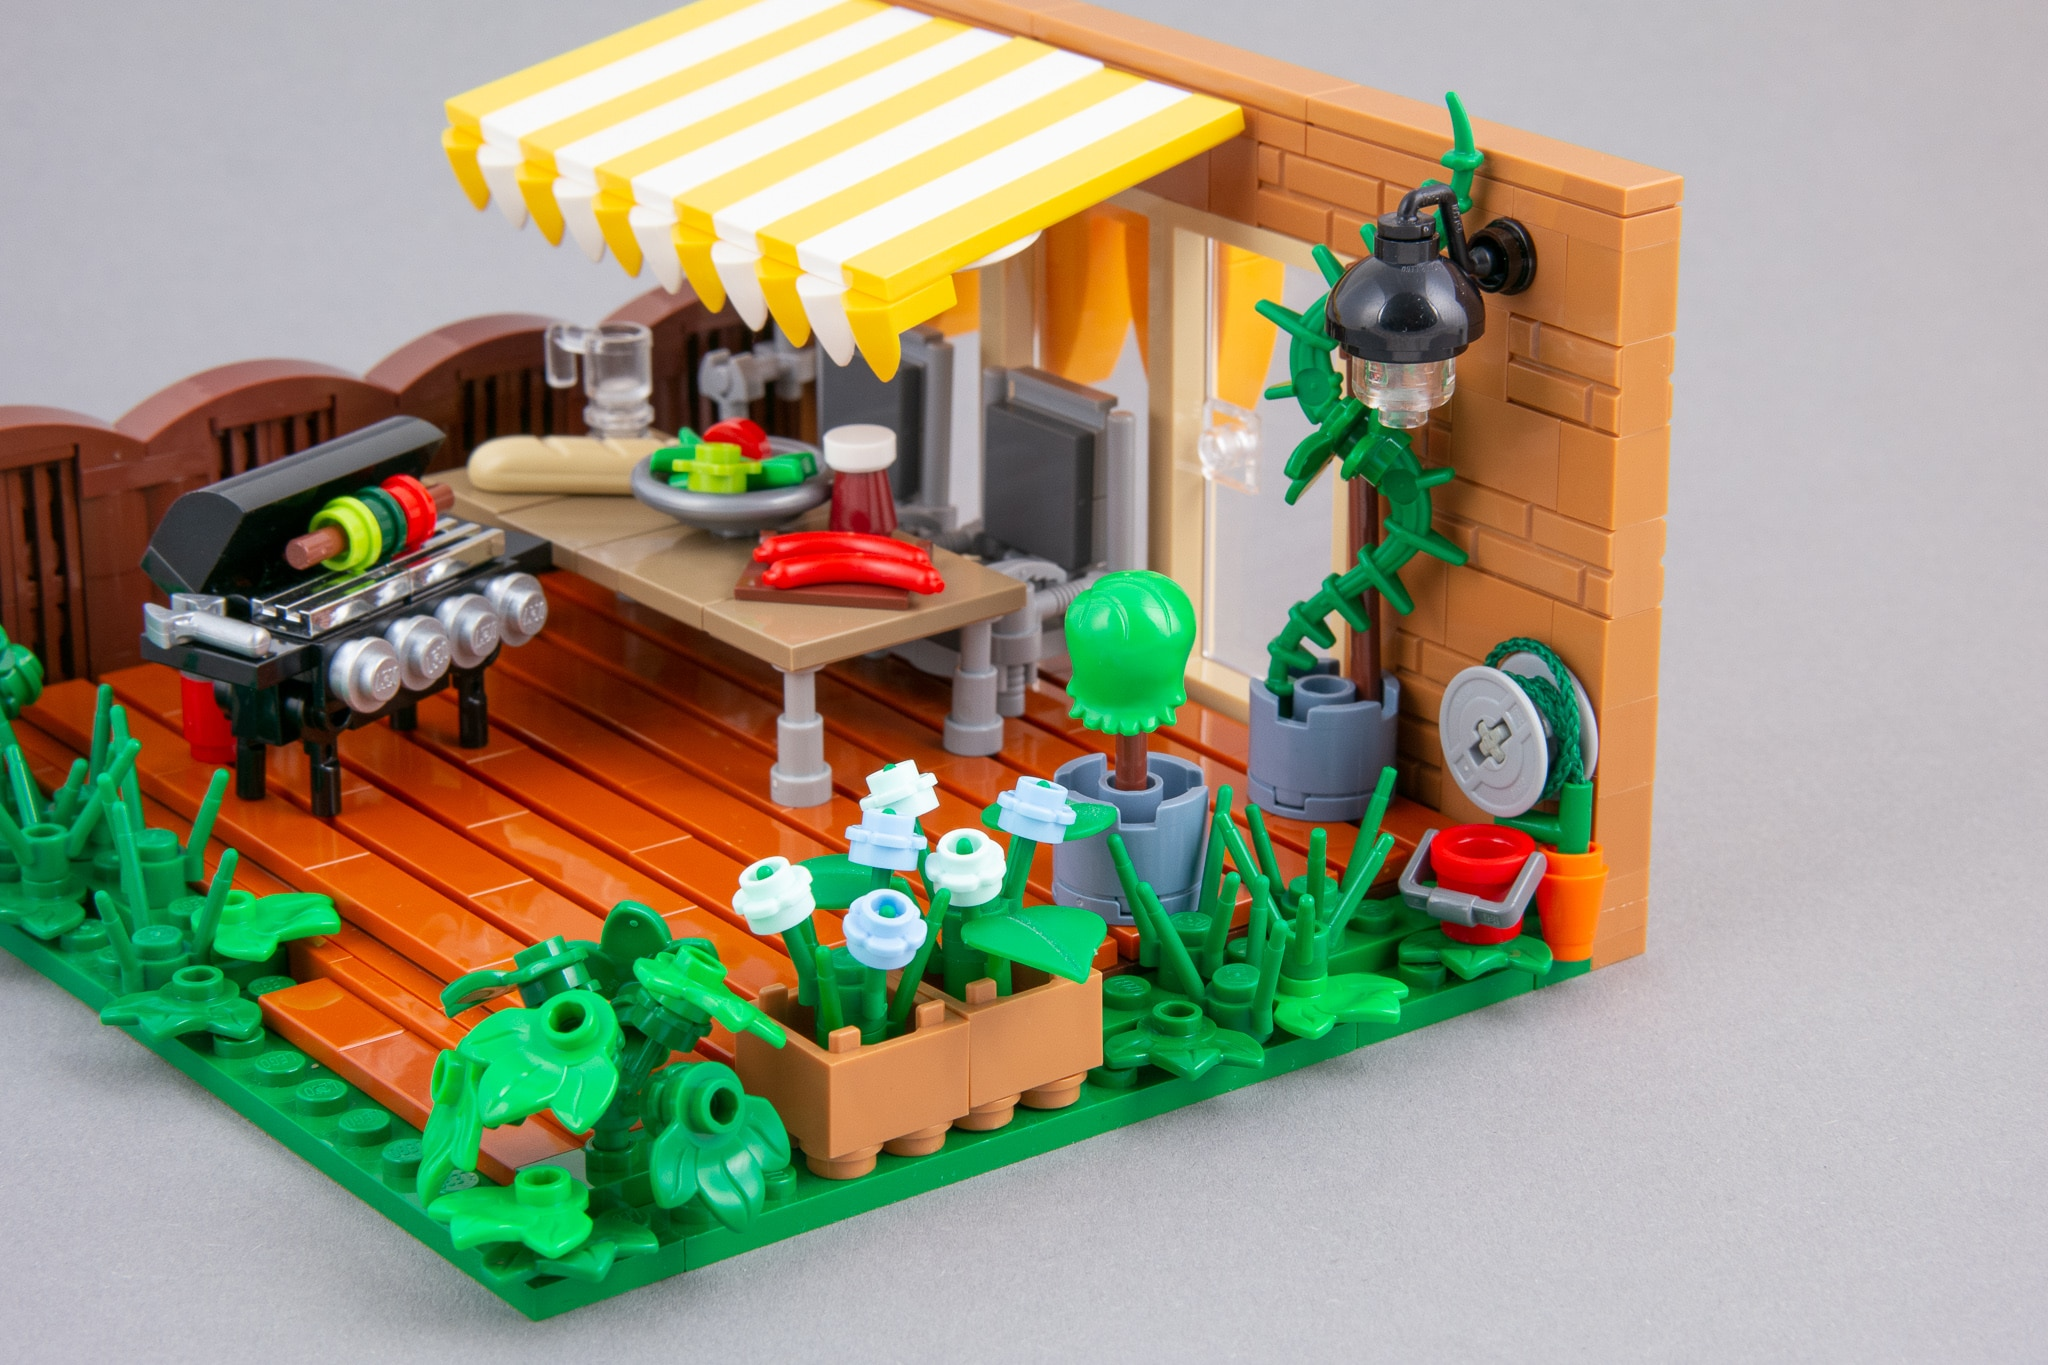 LEGO Terrasse Moc Grillen (14)